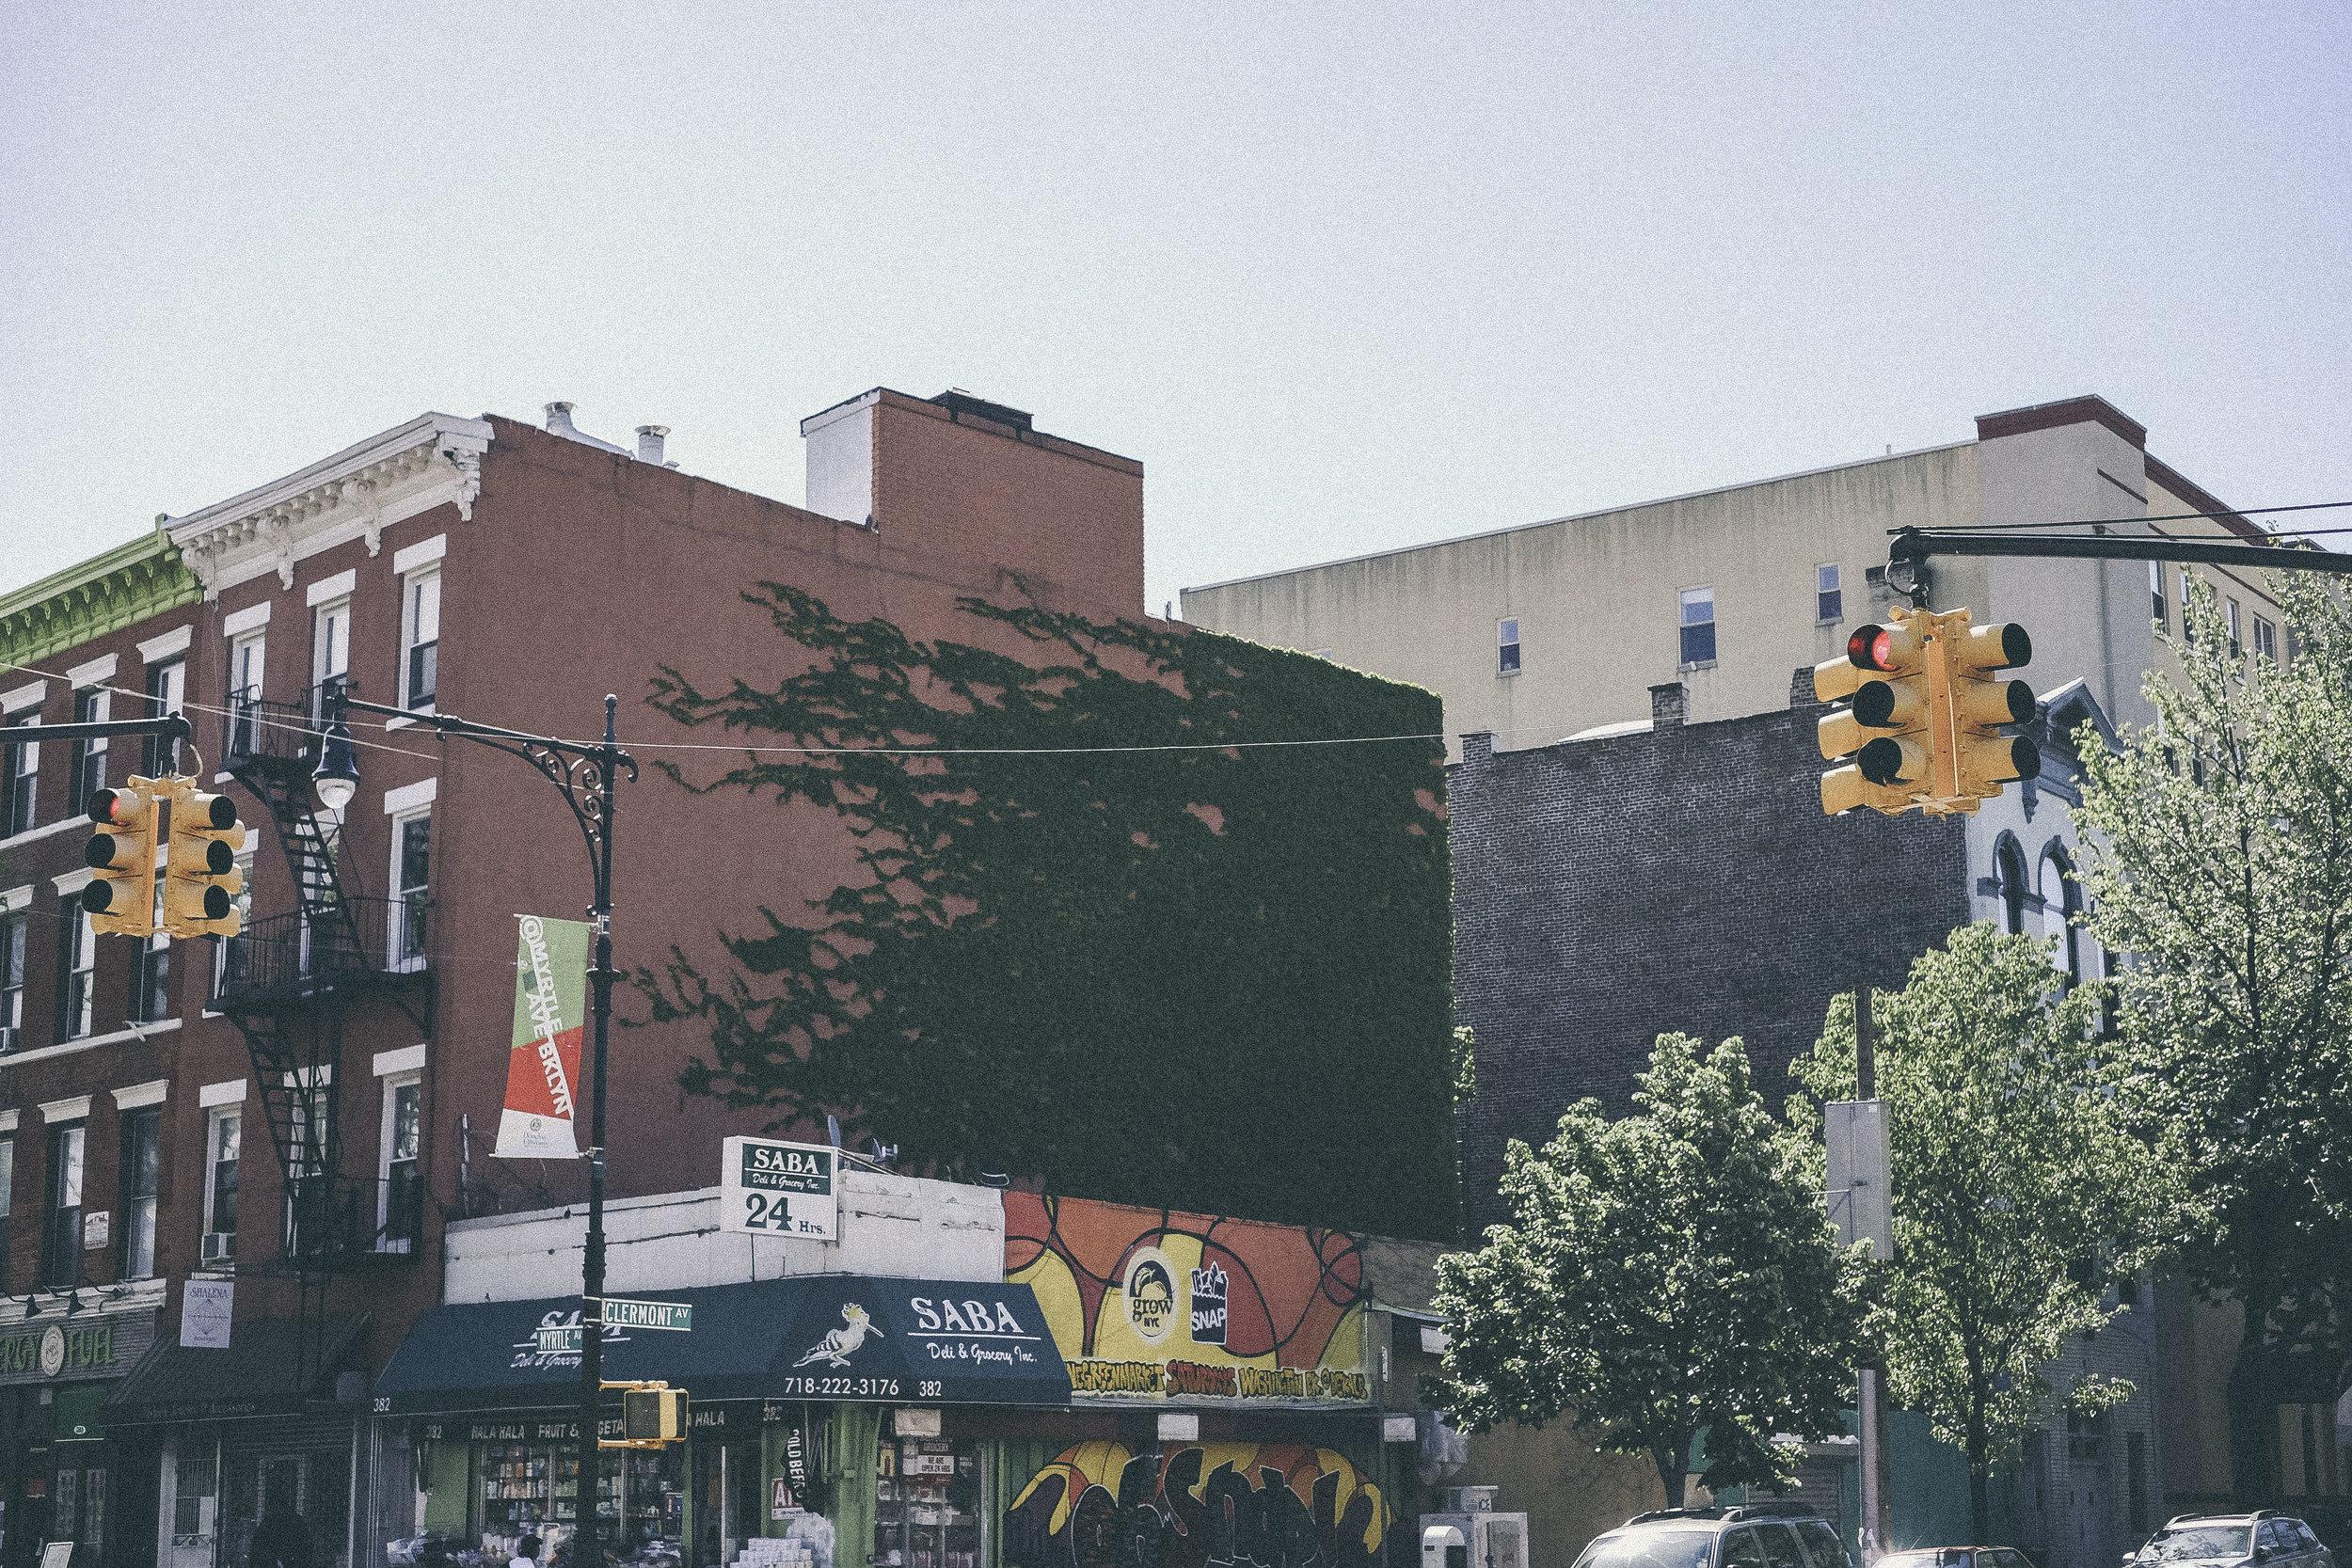 dérrive travel - BROOKLYN, new york #cafemogador #katzsdeli #soho #dumbo #newyork #nyc #brooklyn